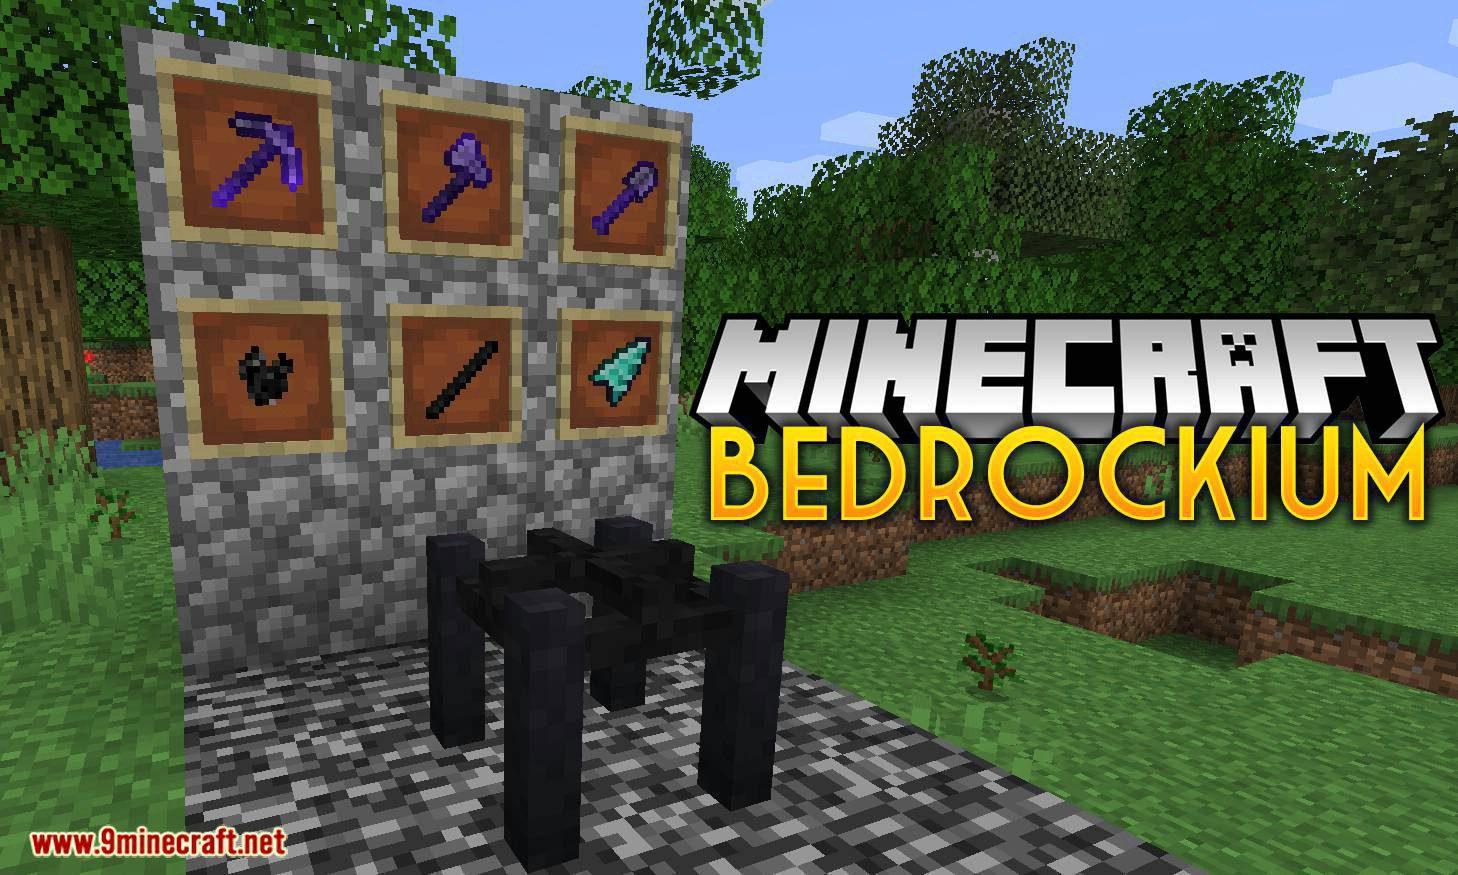 Bedrockium mod for minecraft logo